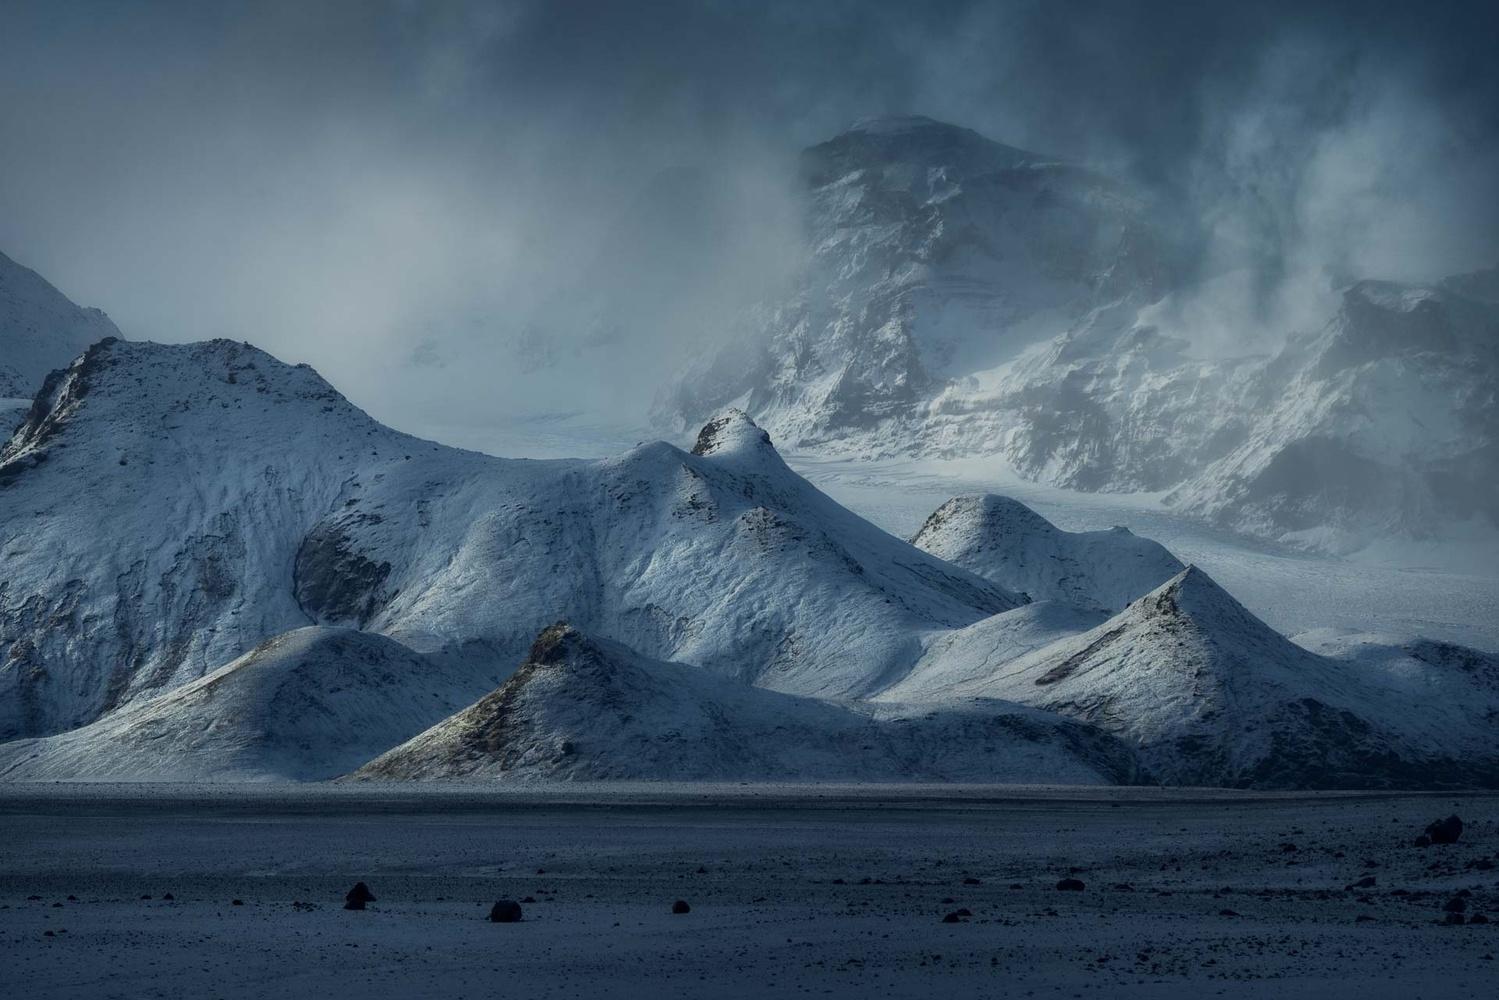 Snowland by Dan Zafra